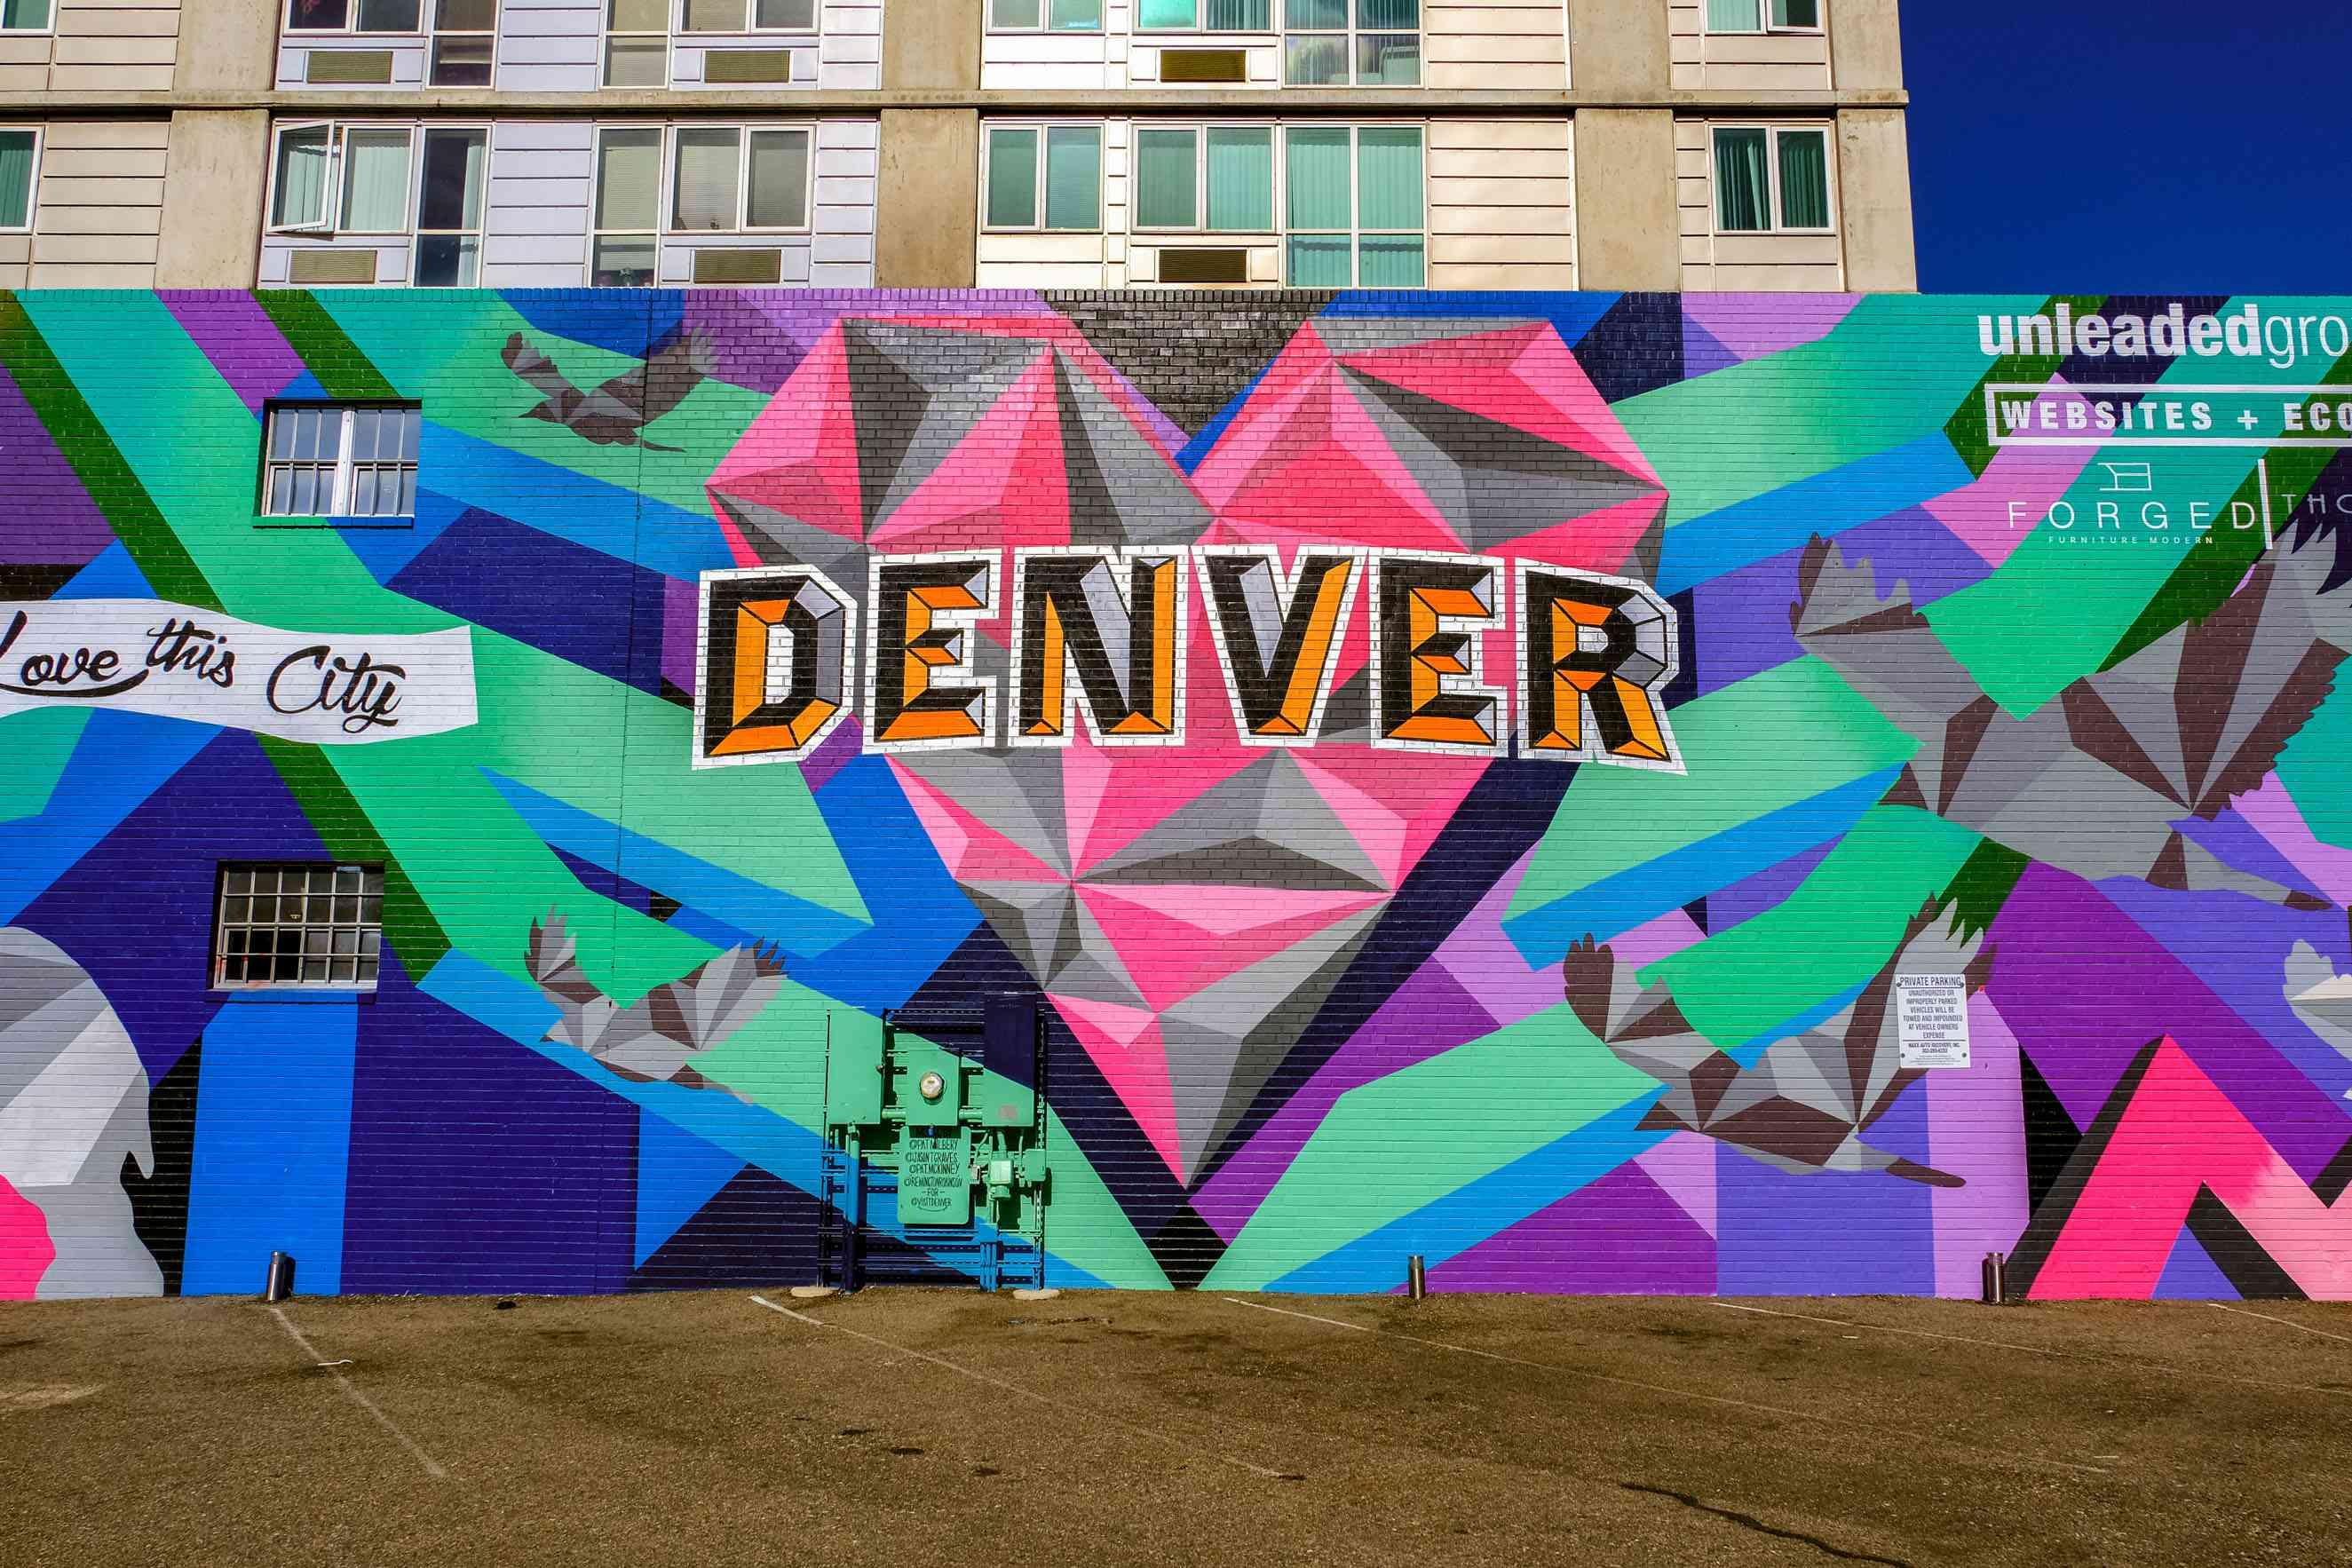 A street art mural with